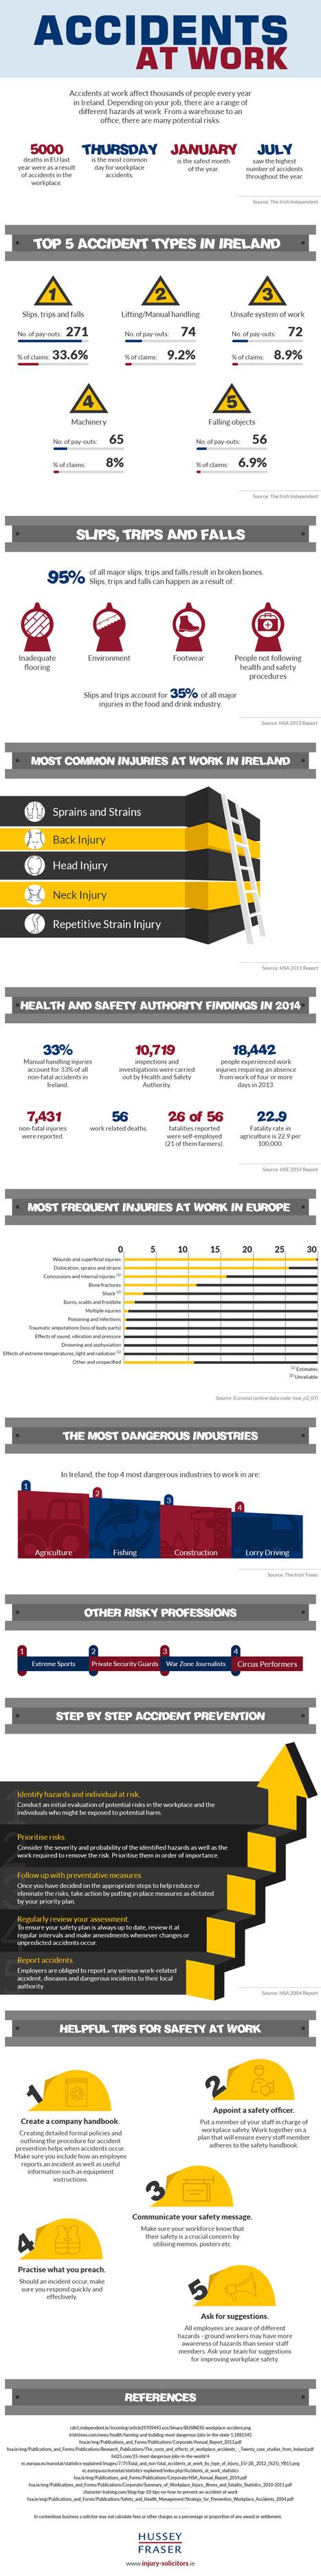 Accidents at Work - People Development Network   MILE Leadership   Scoop.it